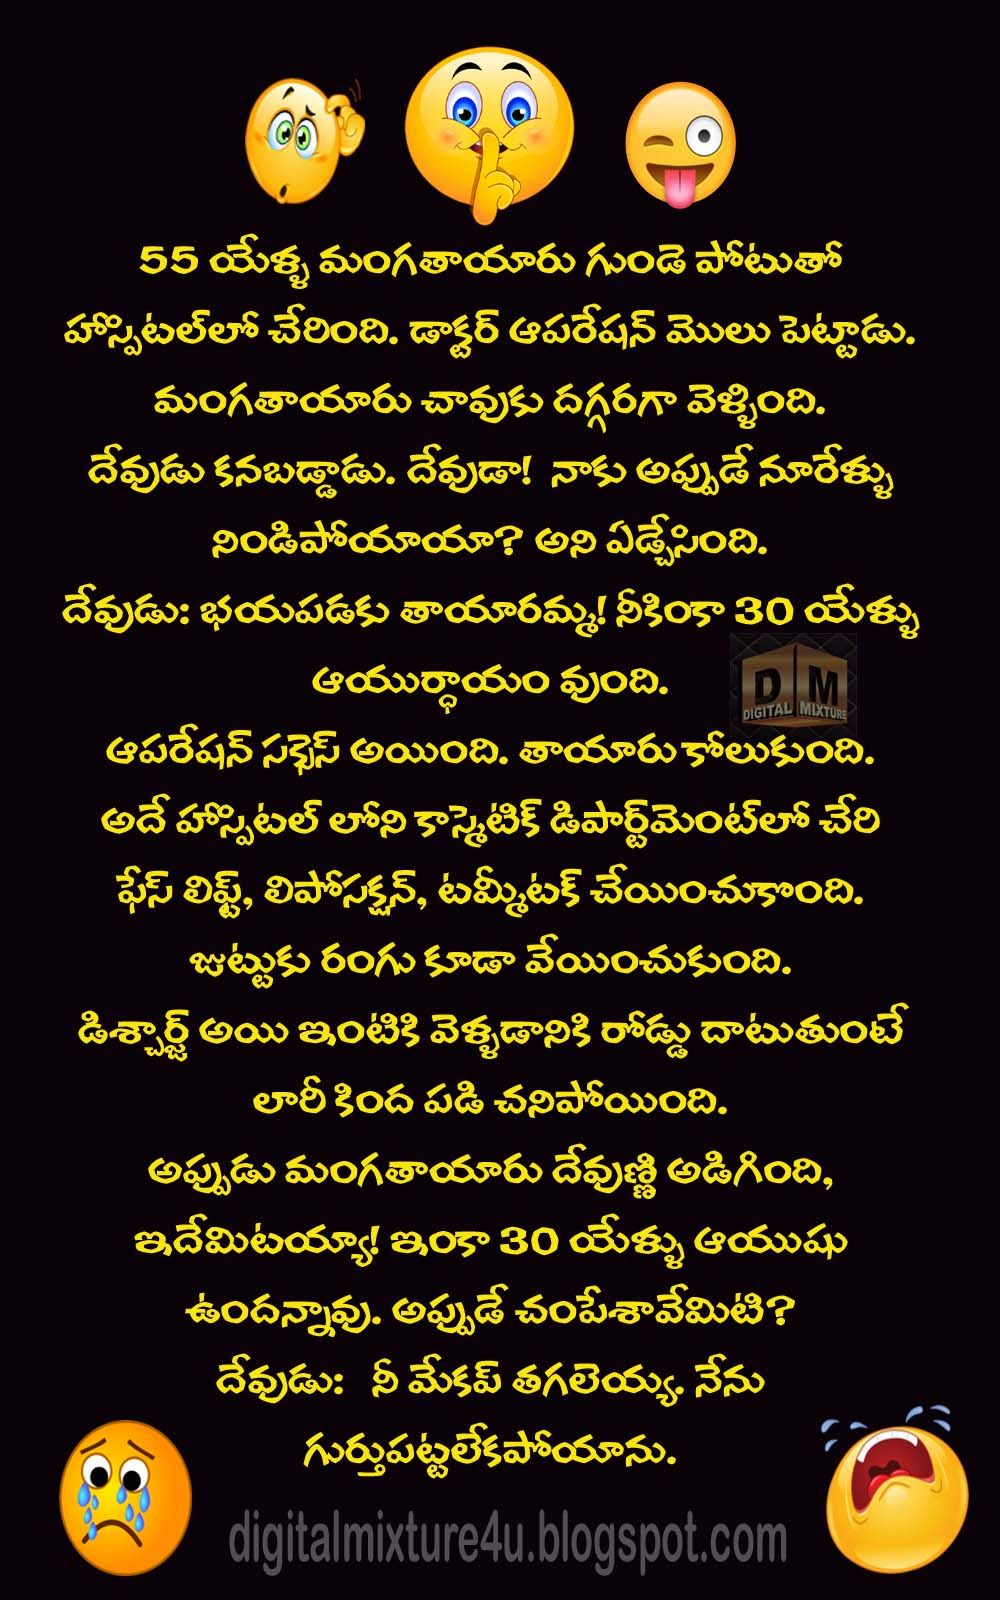 Telugu Joke of the Day Telugu jokes, Telugu